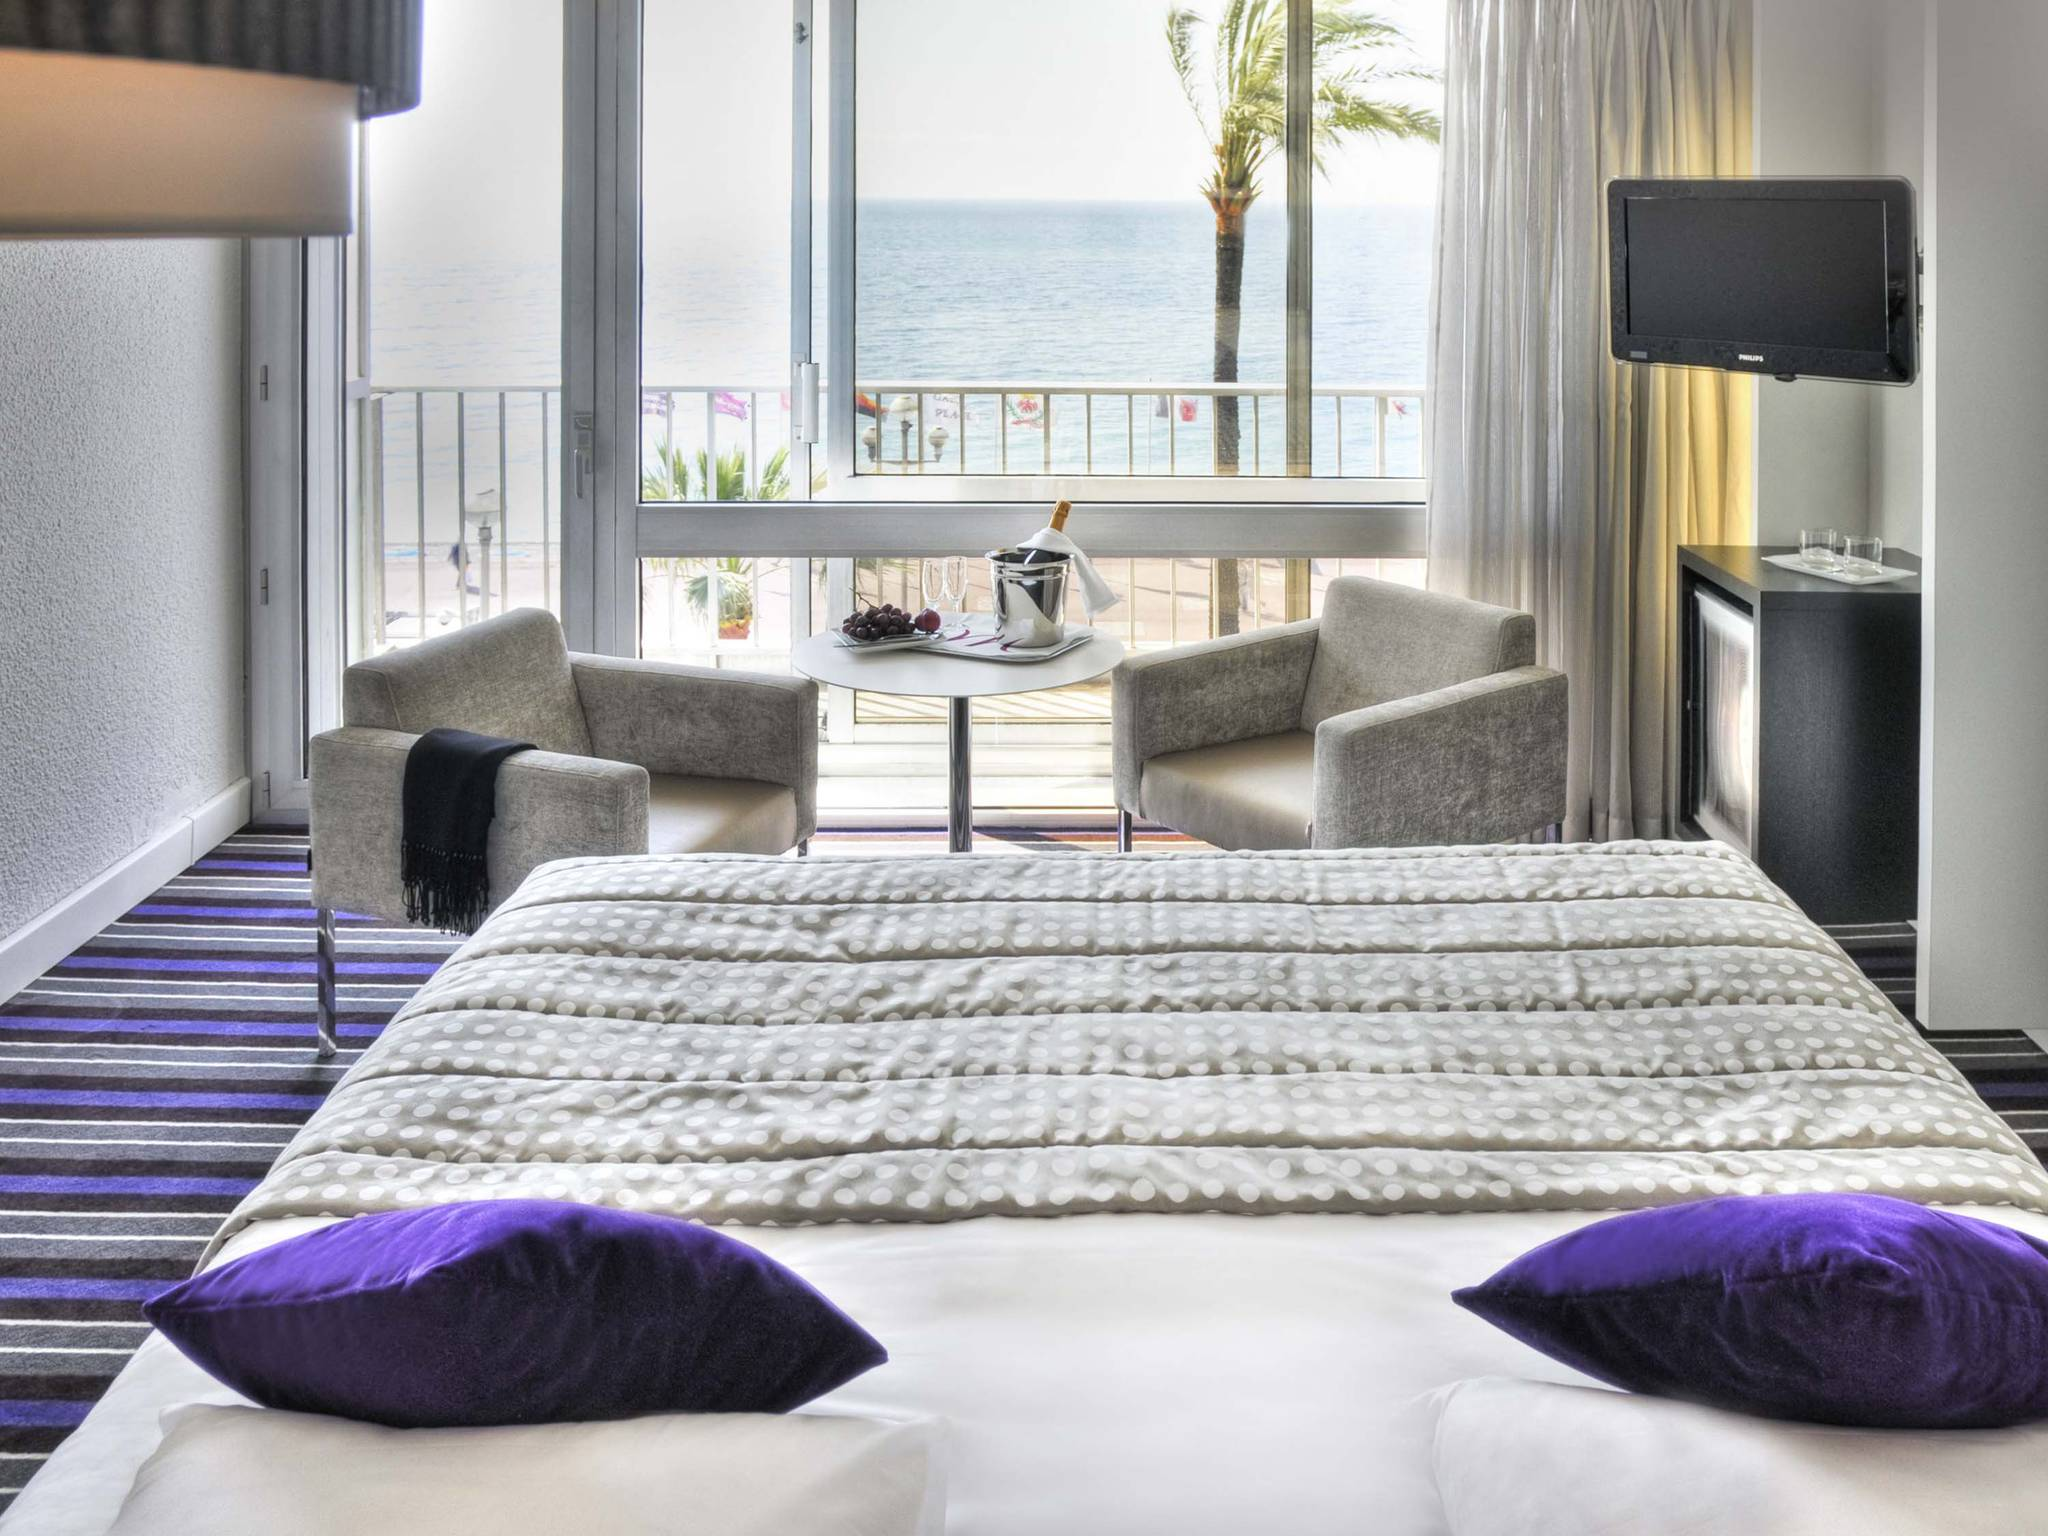 Mercure Hotel Rooms